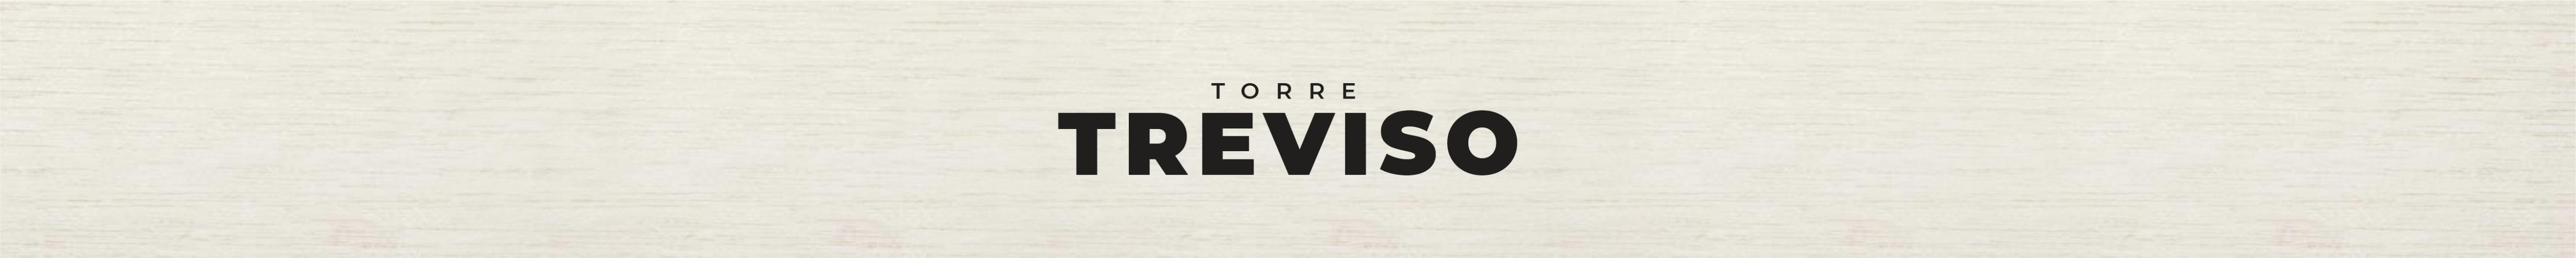 TORRE TREVISO